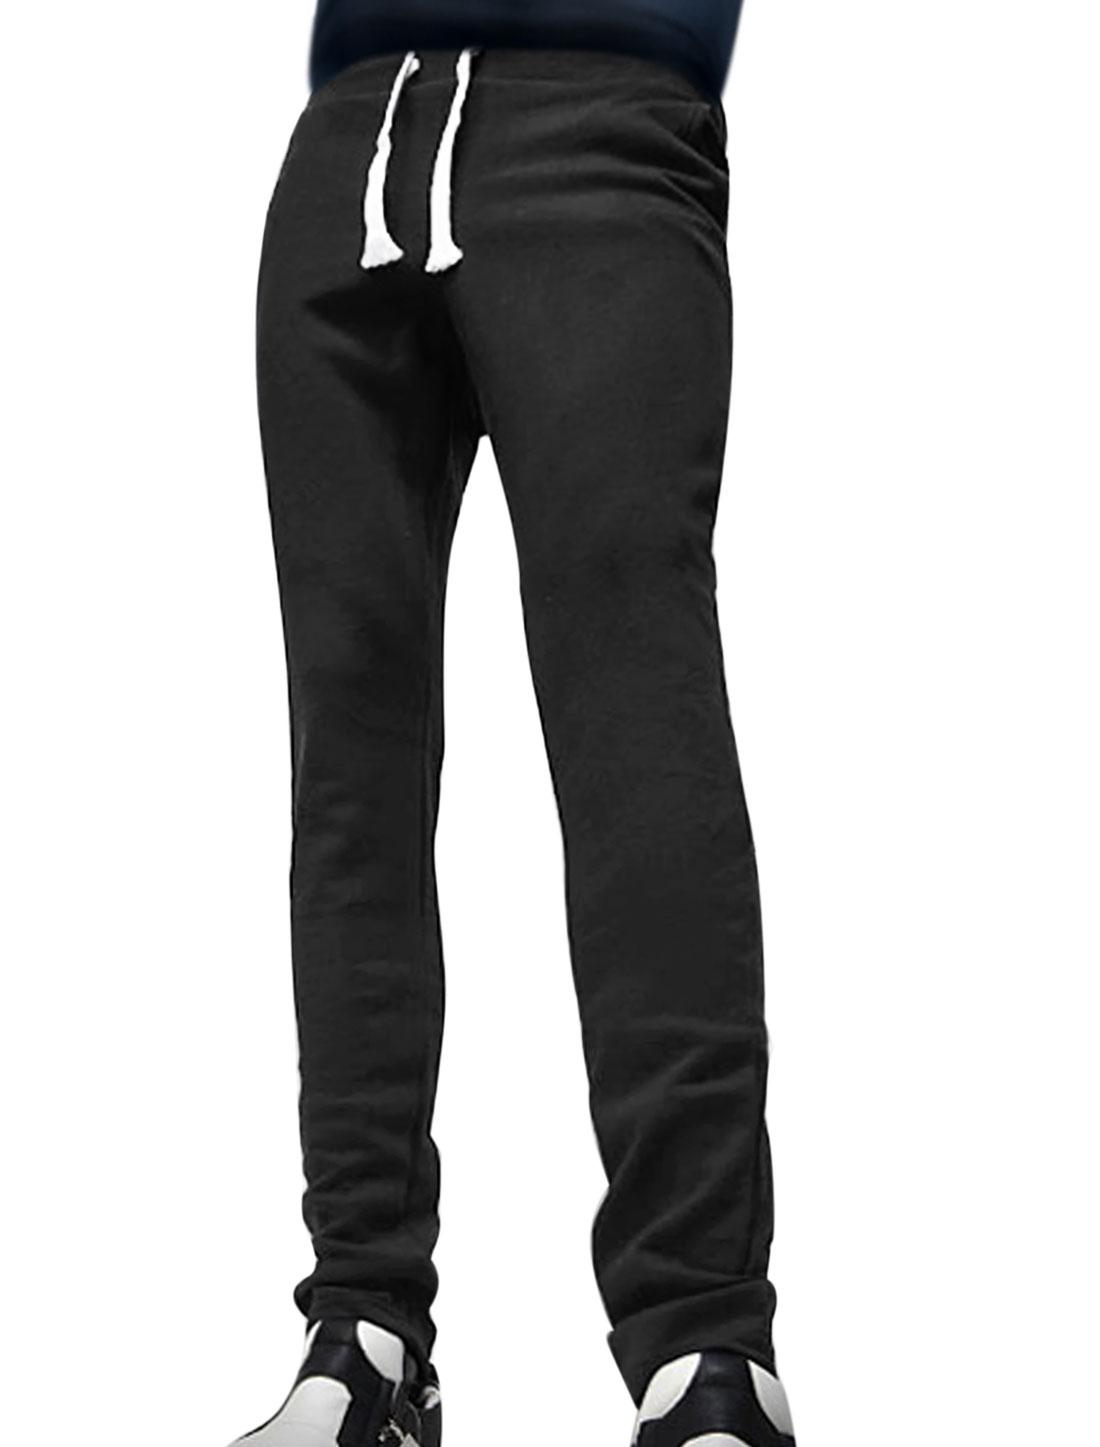 Men Drawstring Elastic Waist Tapered Slim Fit Pants Black W32